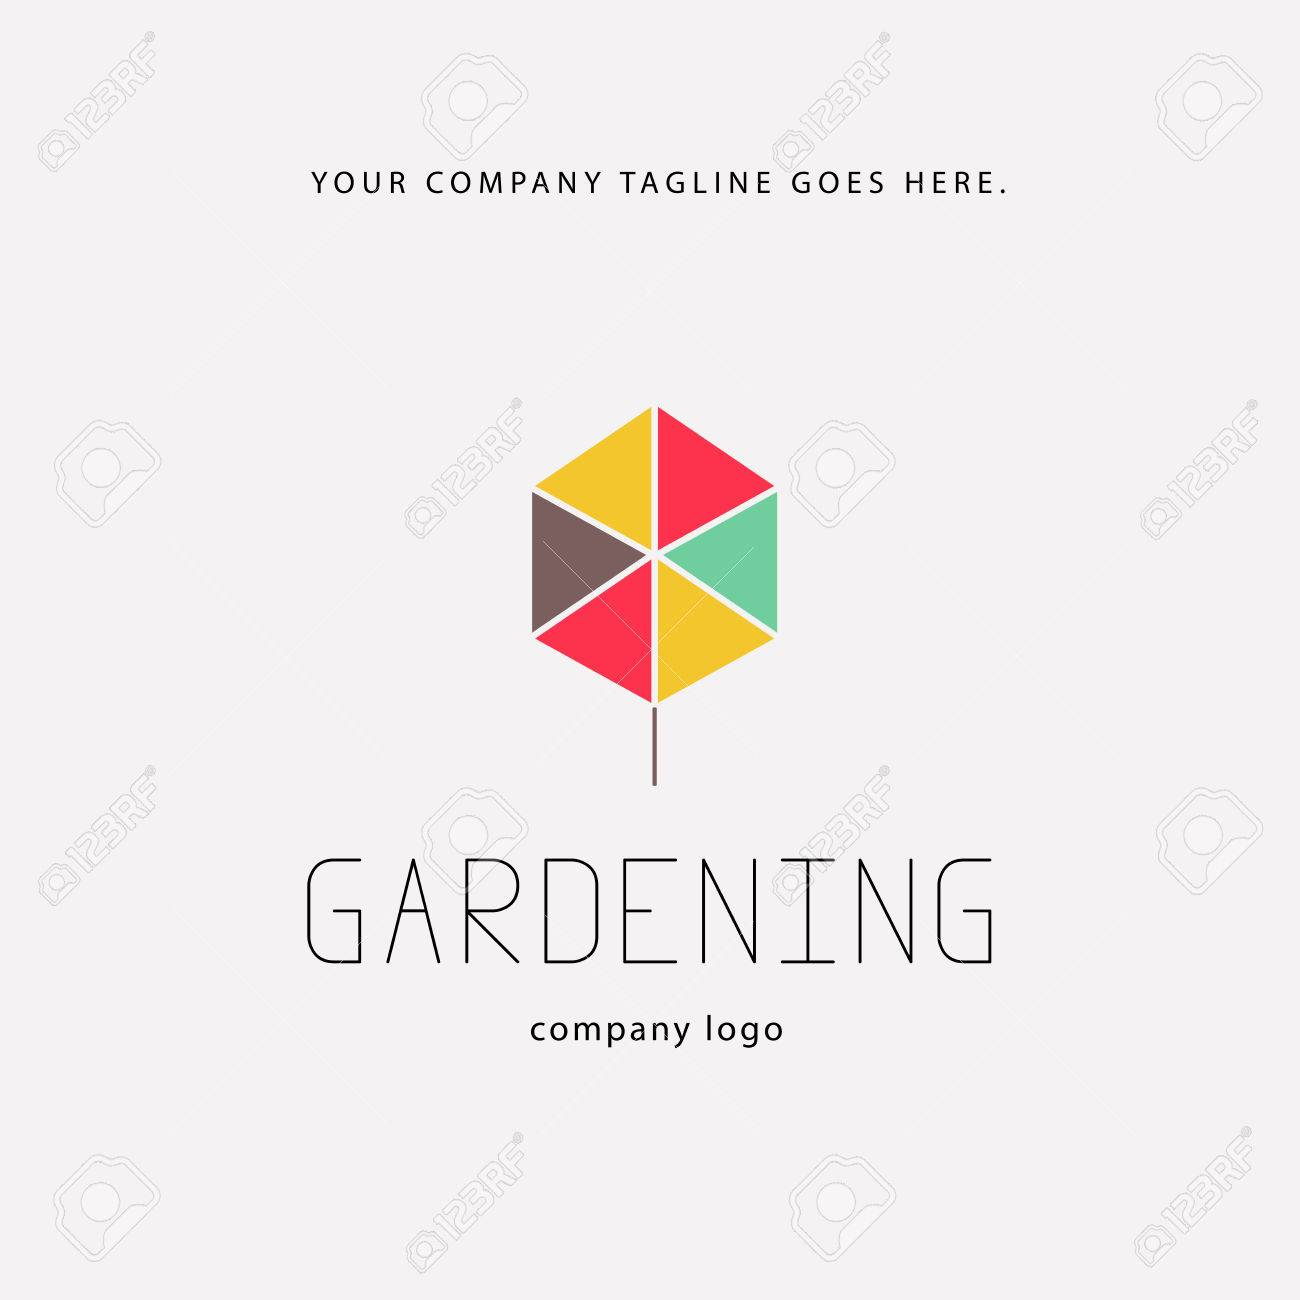 Vector   Vector Flat Elegant Logo Template For Gardening Companies.  Gardening Service Brand Mark Graphic Sample.